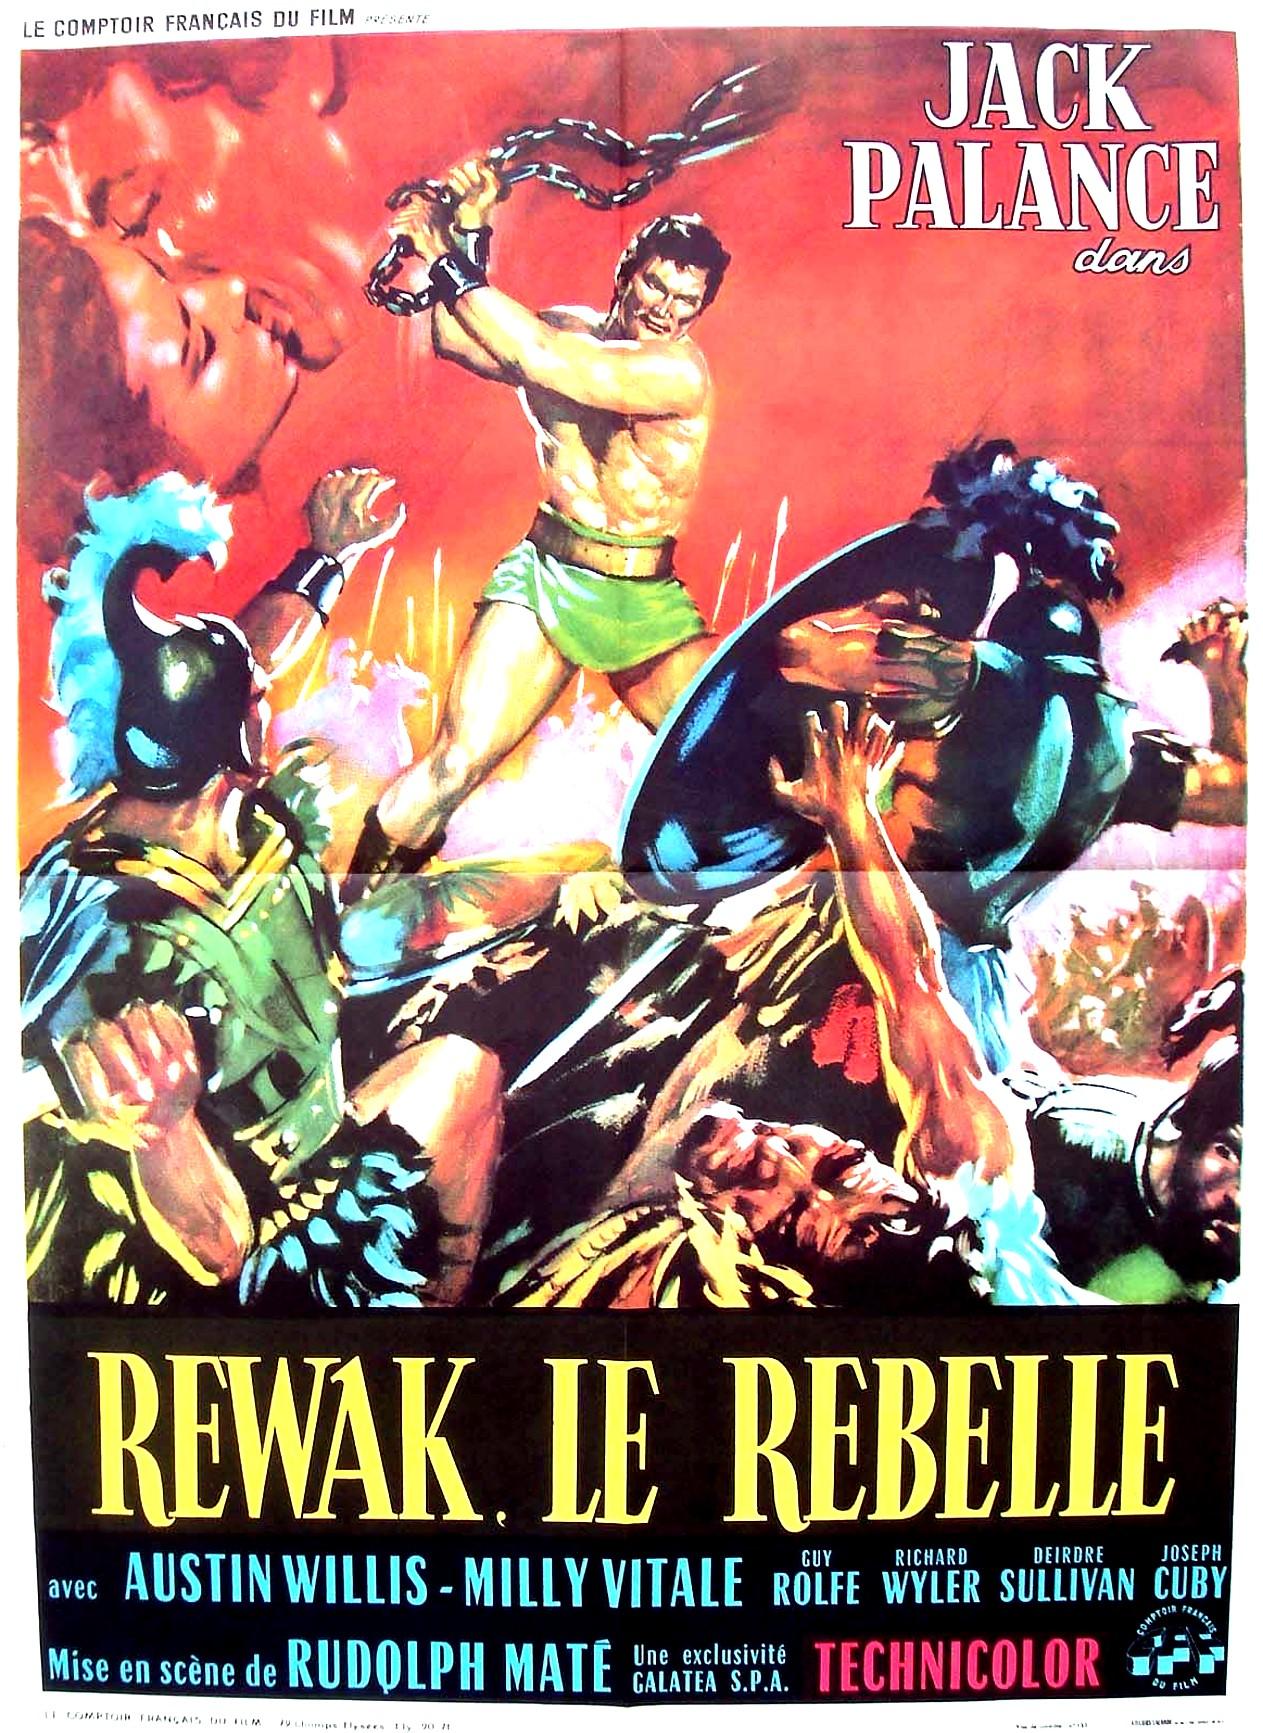 Jack Palance Filmes Delightful du film rewak le rebelle